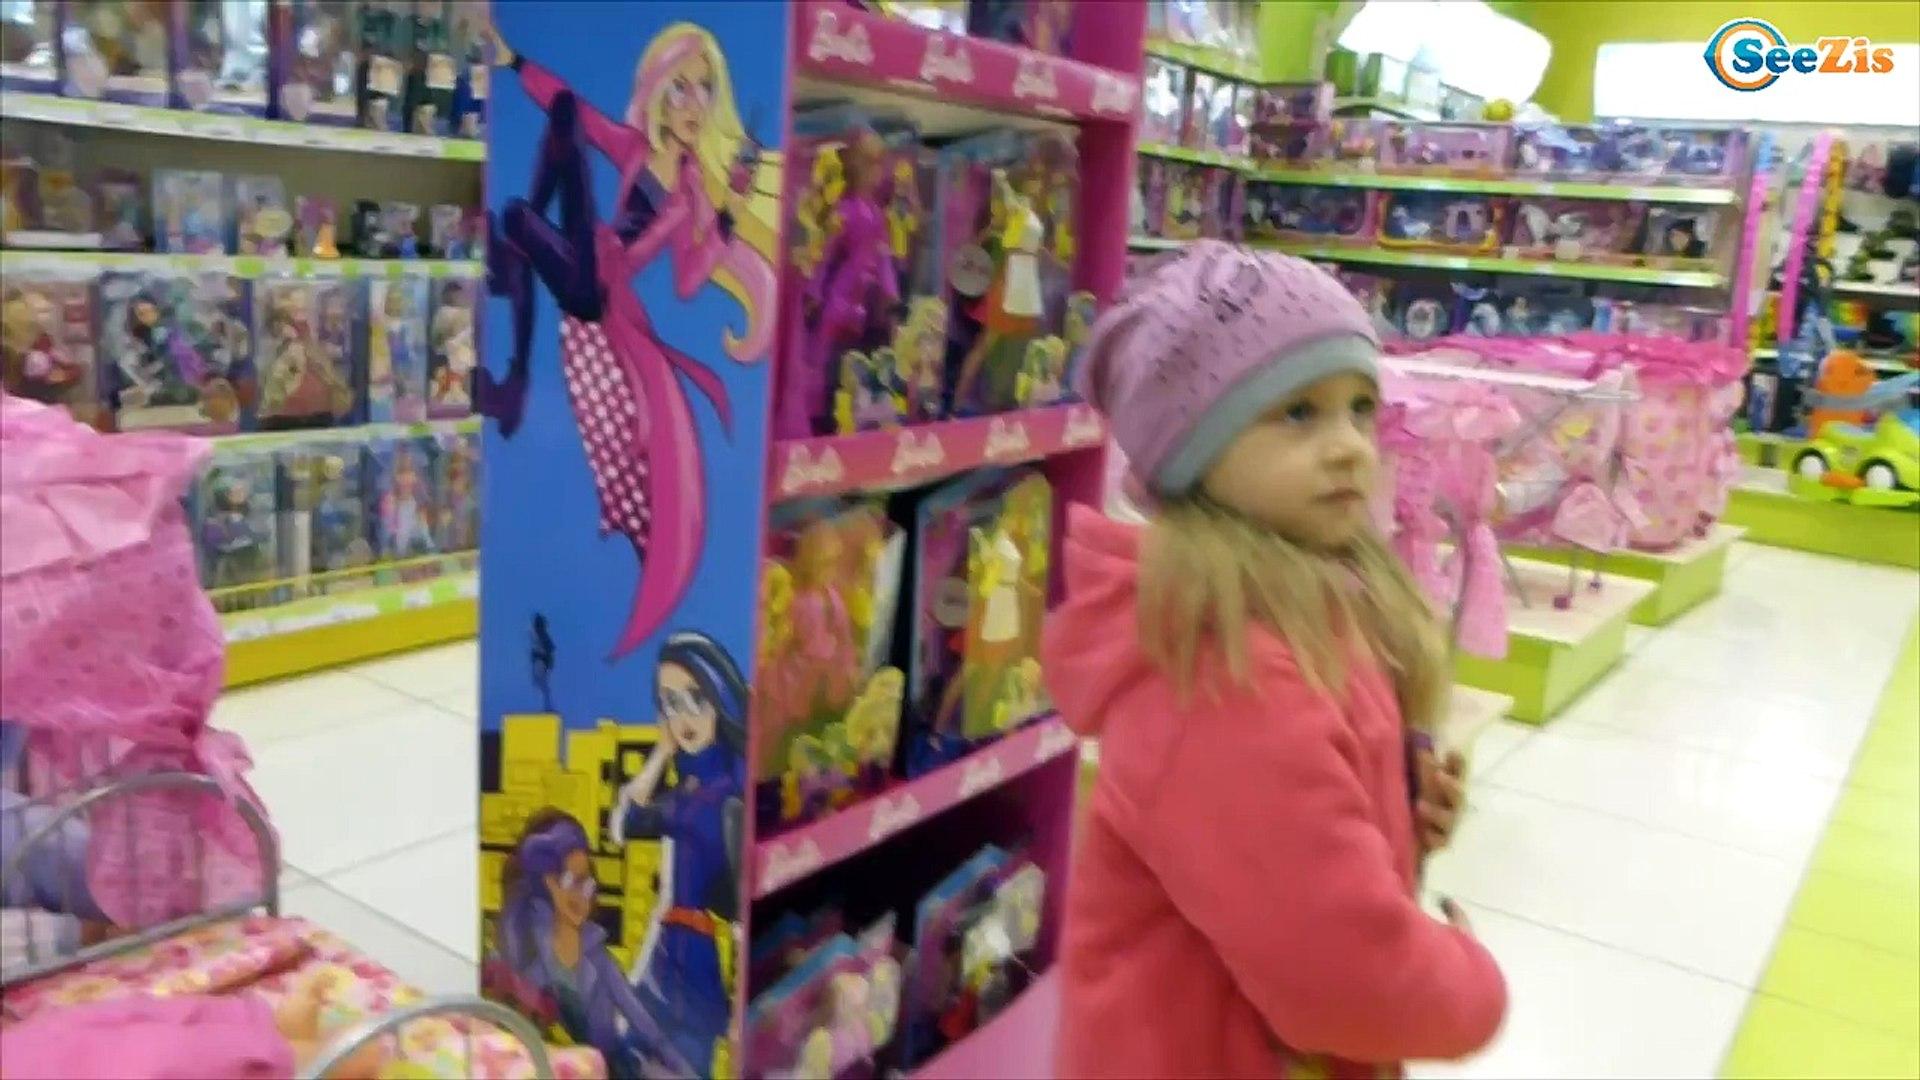 Кукла Барби и Ярослава. Шопинг в магазине игрушек. Барби и Кен. Видео для девочек. Tiki Taki Kids